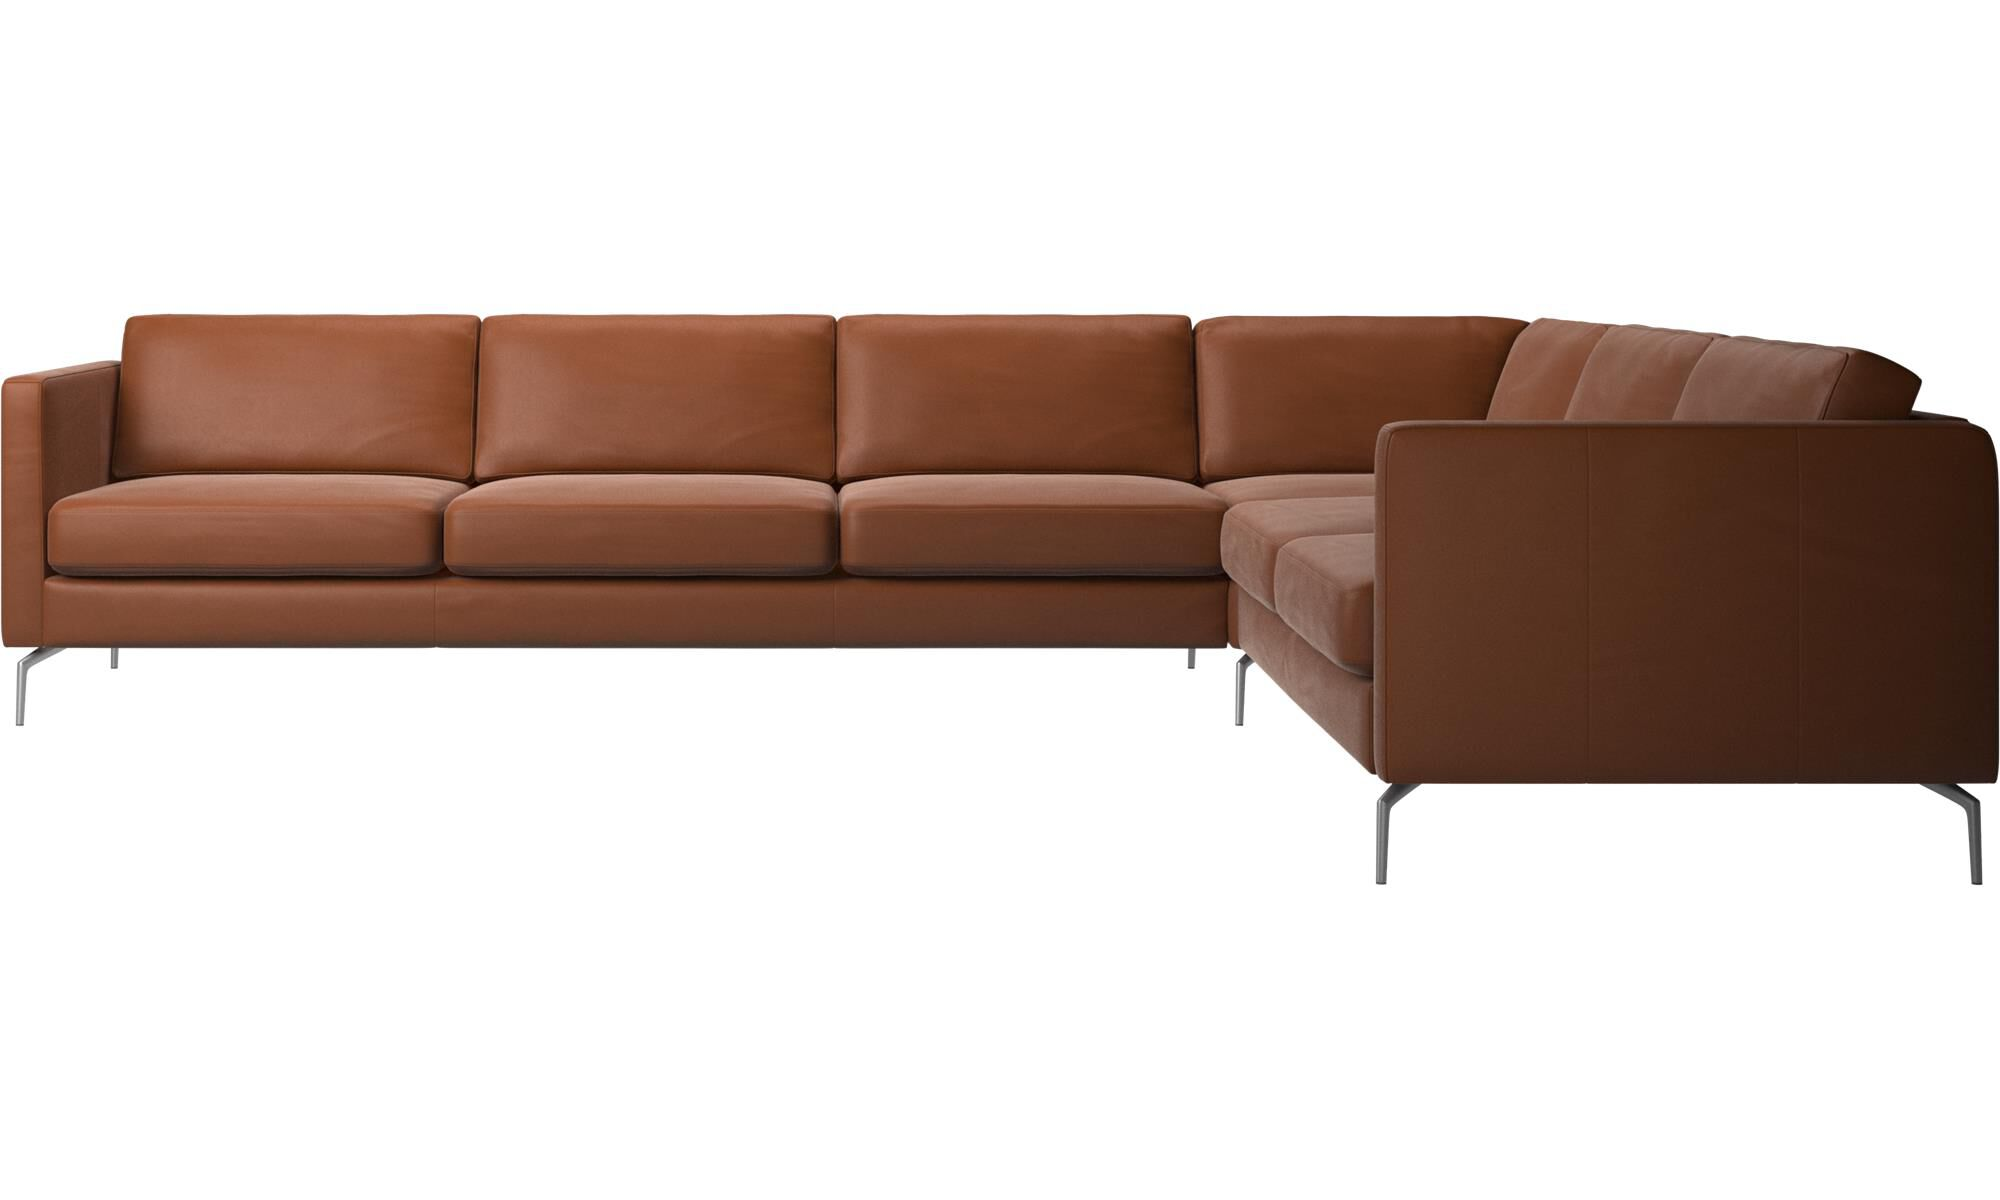 Good Corner Sofas   Osaka Corner Sofa, Regular Seat   Brown   Leather